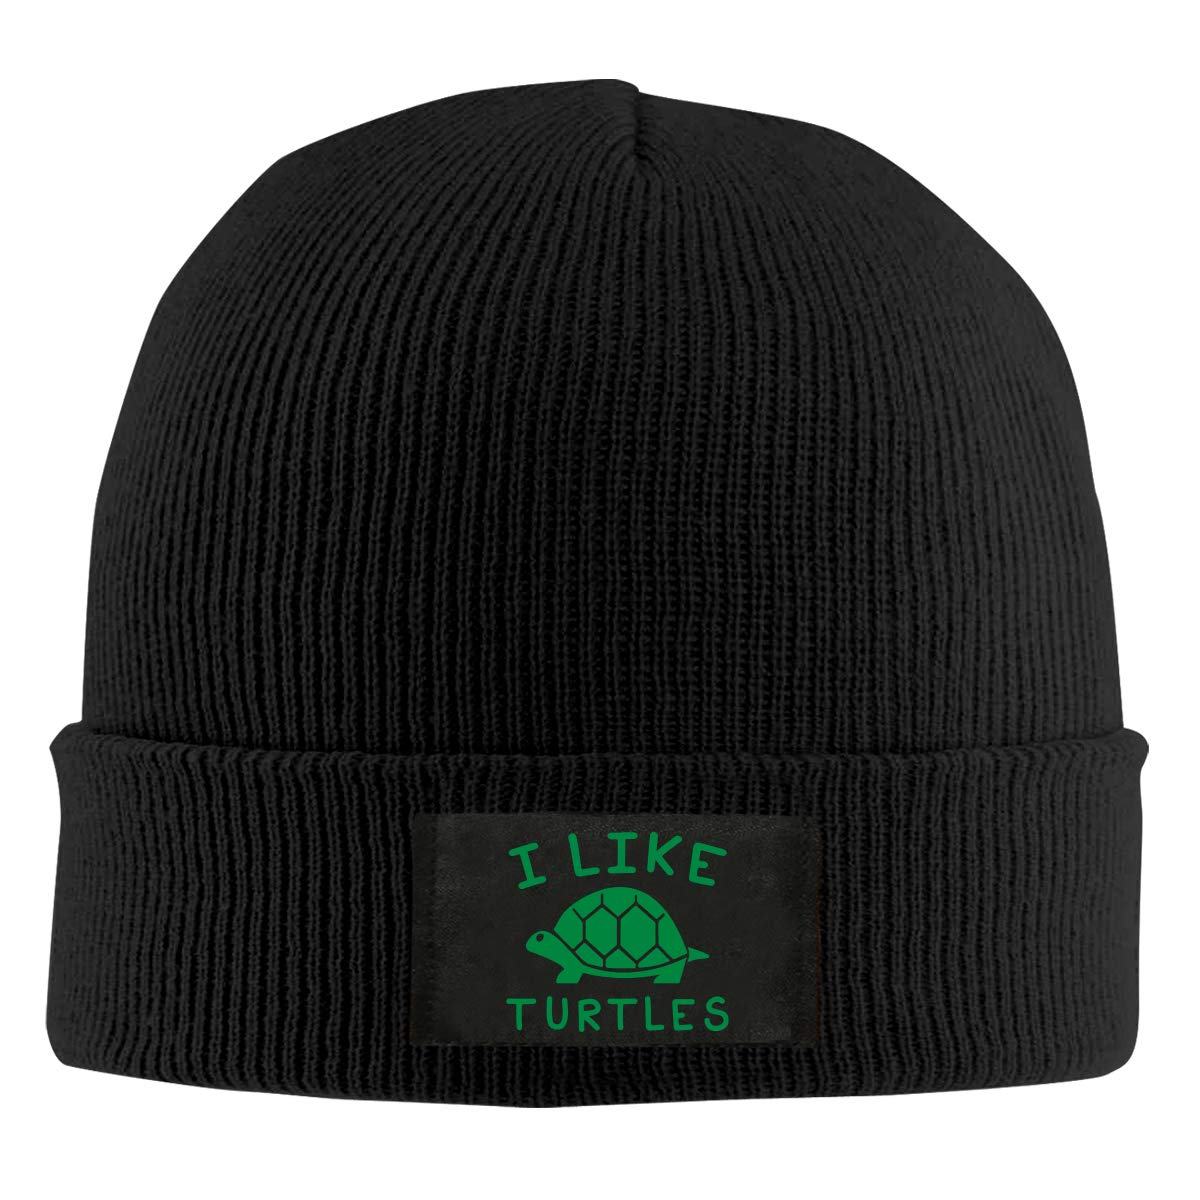 Unisex I Like Turtles Knit Cap 100/% Acrylic Trendy Skull Cap